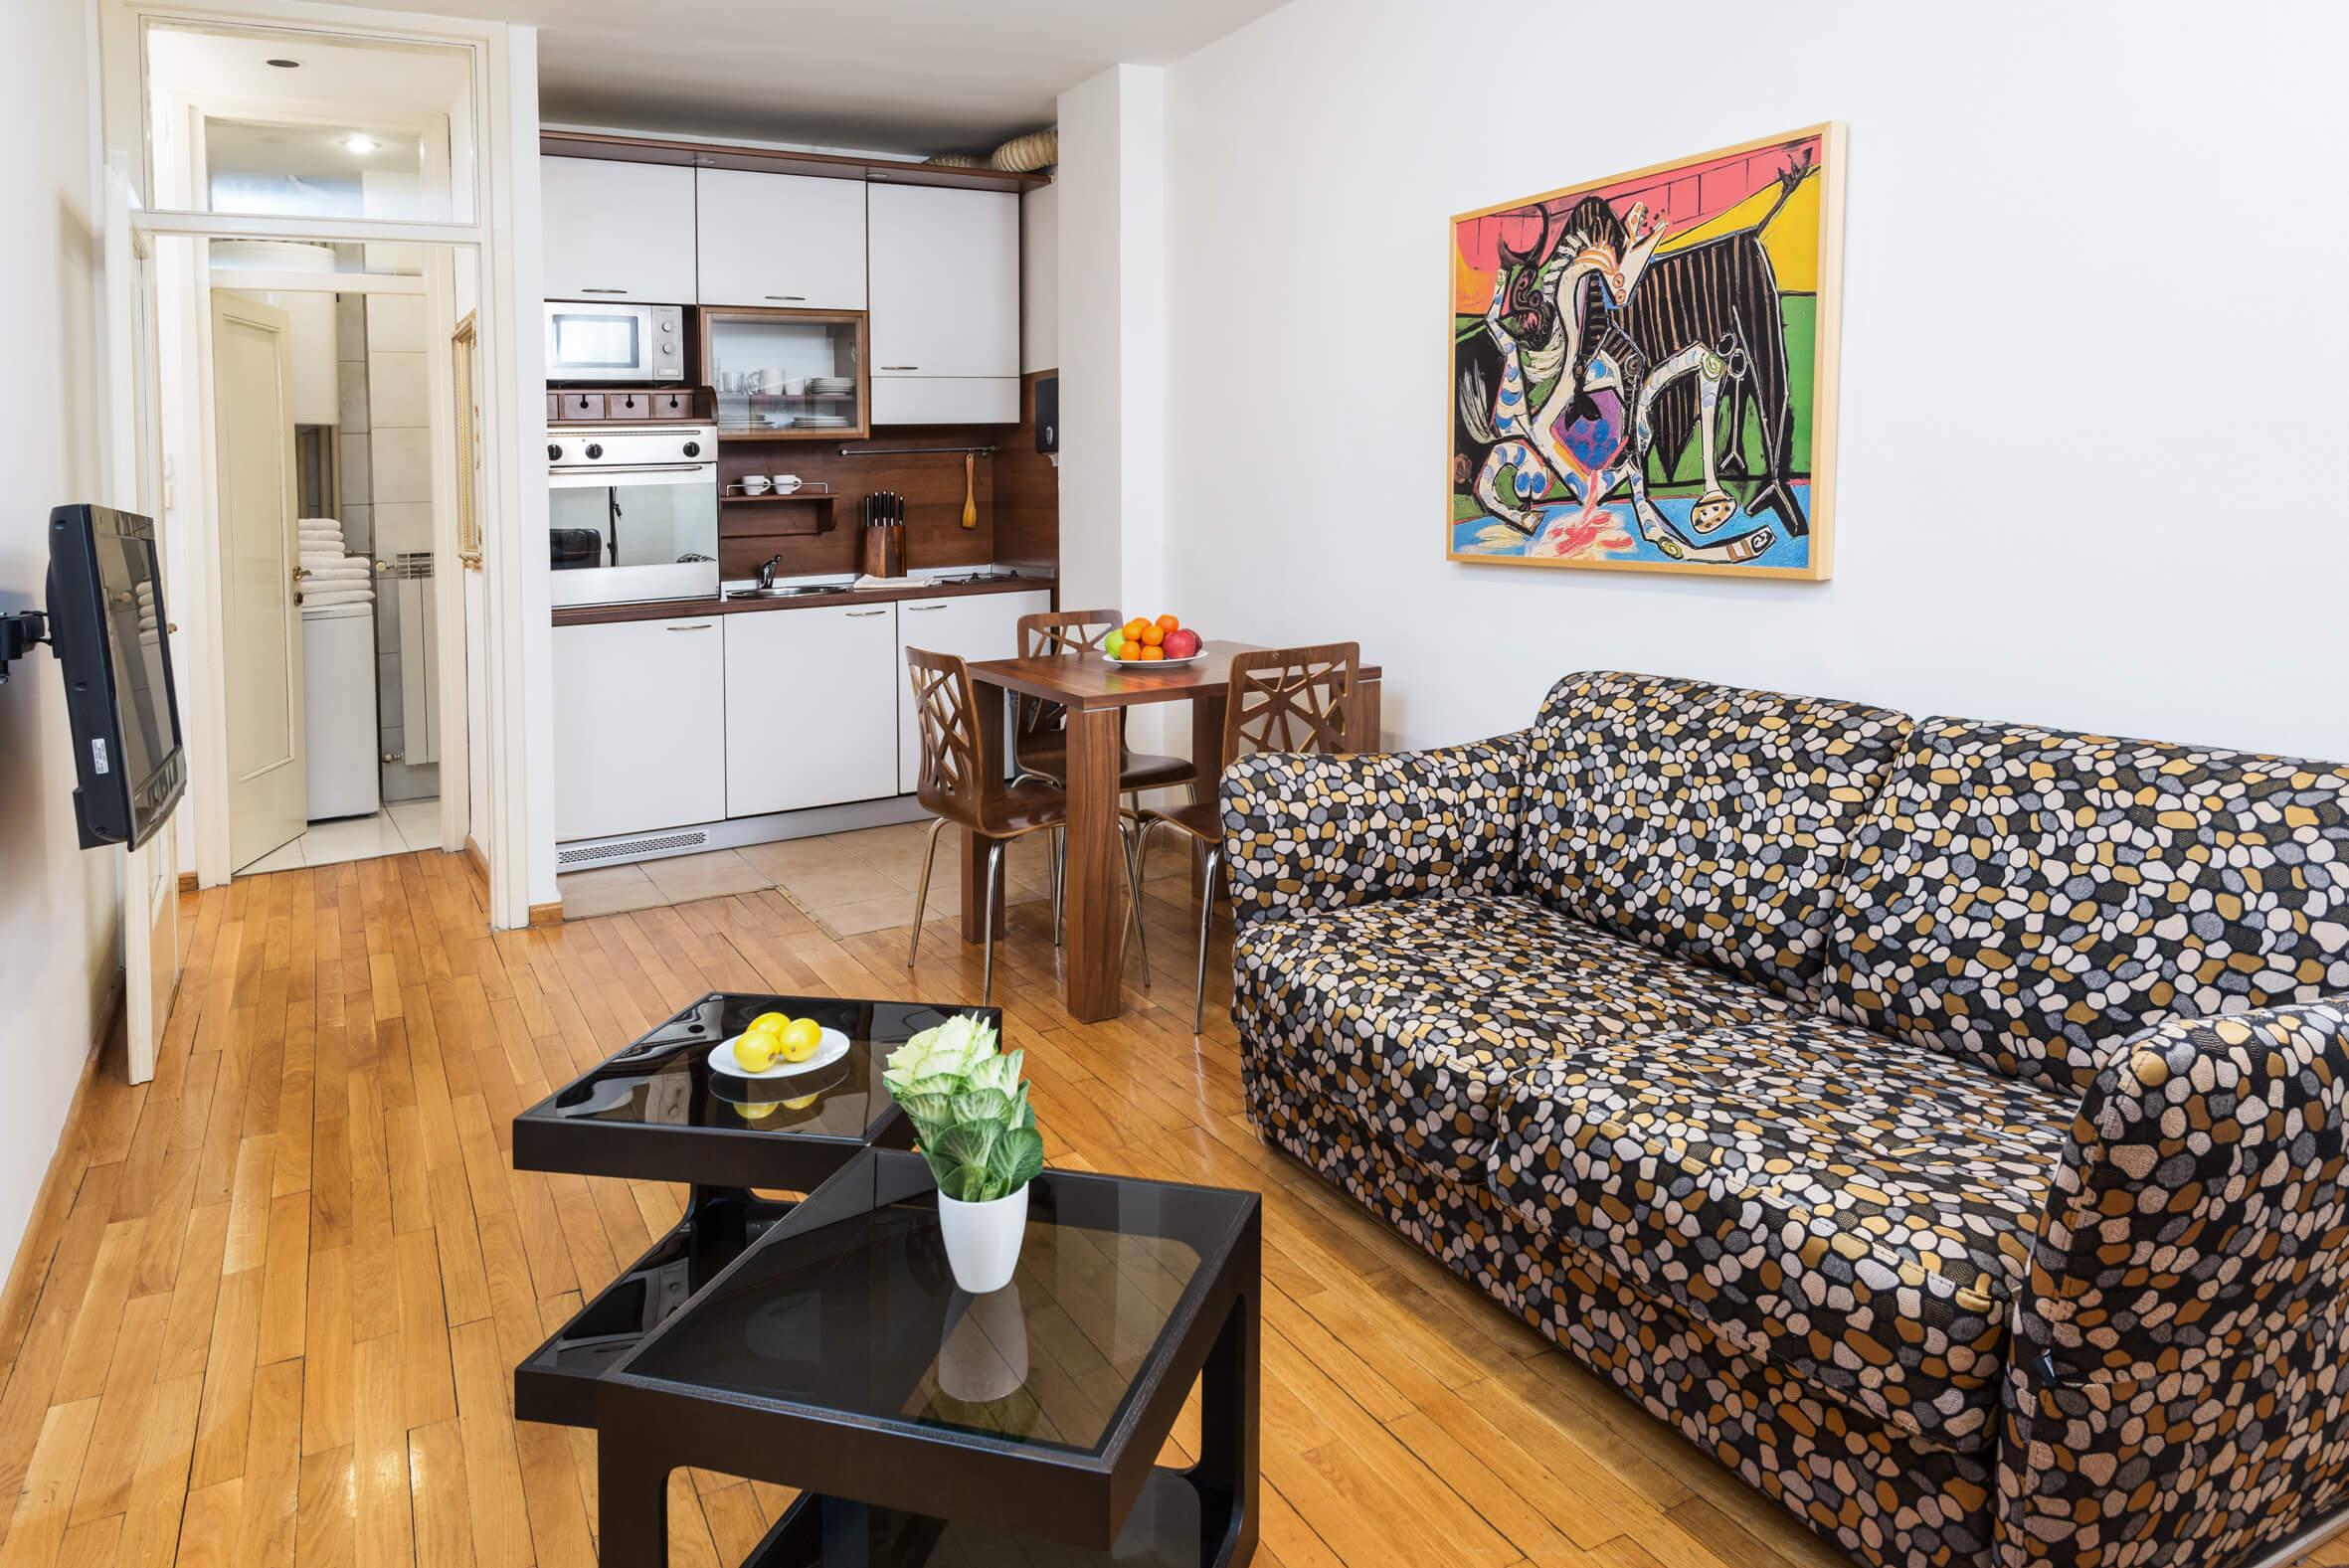 Apartmani Beograd | Stan na dan Beograd centar | Apartman A25 - Dnevni boravak, trpezarija i kuhinja